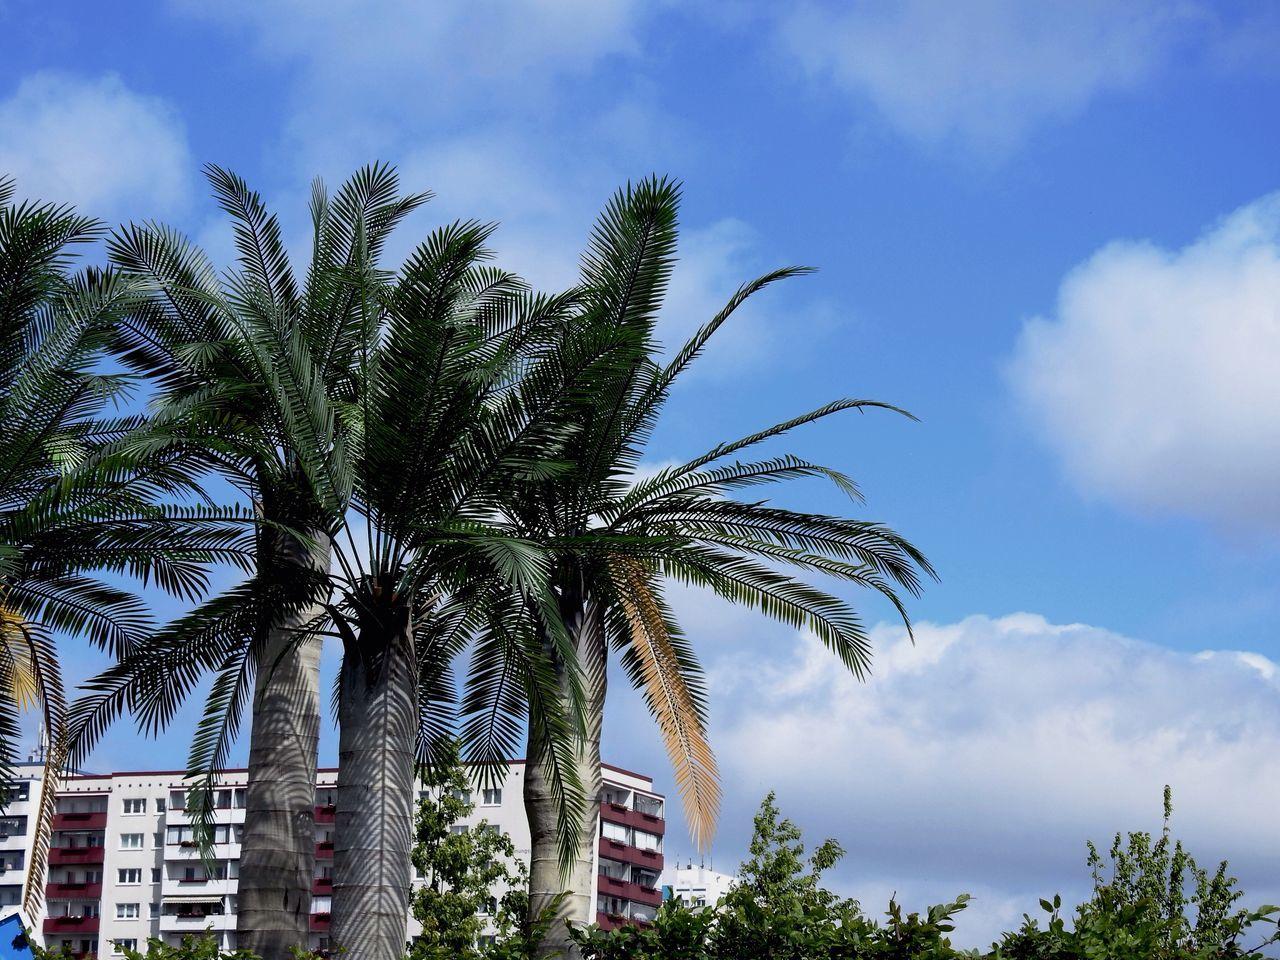 Palm Tree Tree Sky Low Angle View Growth Cloud - Sky No People Day Outdoors Nature IGA 2017 Berlin Germany